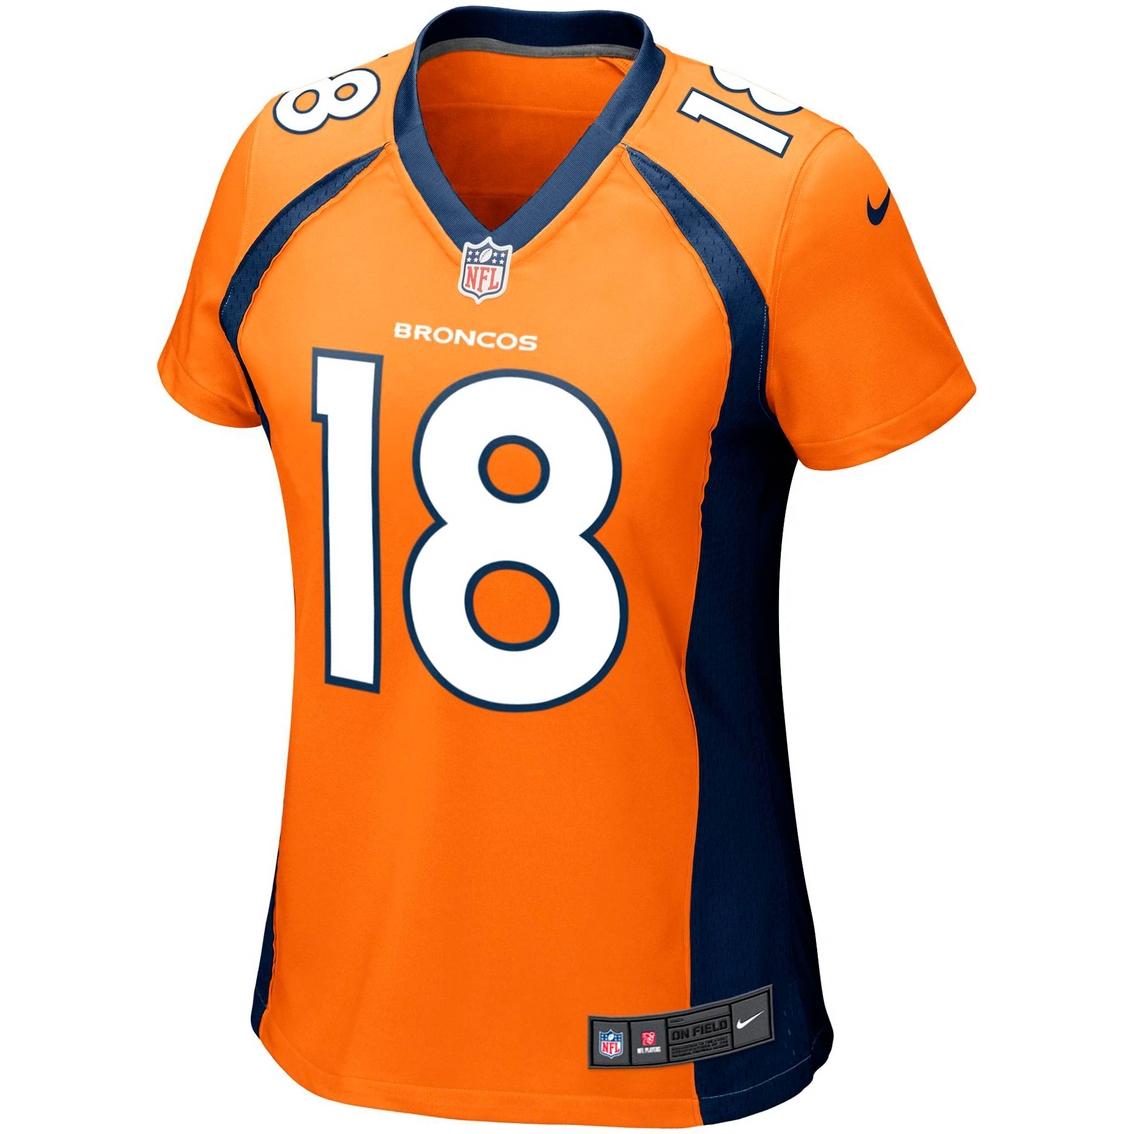 bc167a4d6 Nike Nfl Denver Broncos Women s Peyton Manning Jersey